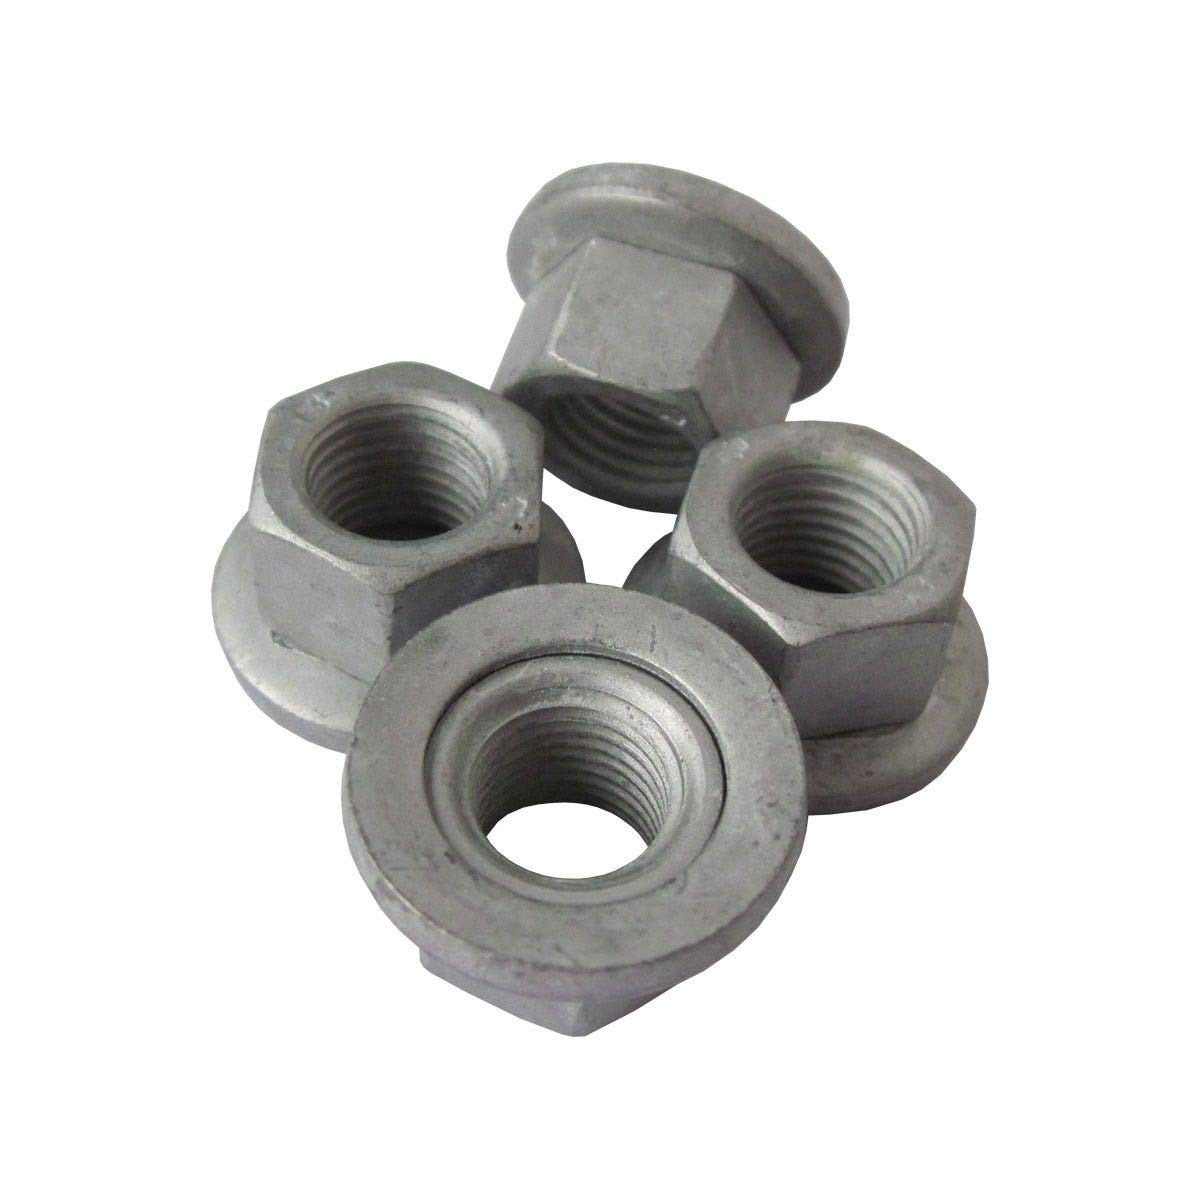 Set of 4 Polaris Sportsman Ranger 3//8 Flange Wheel Lug Nut 7547237